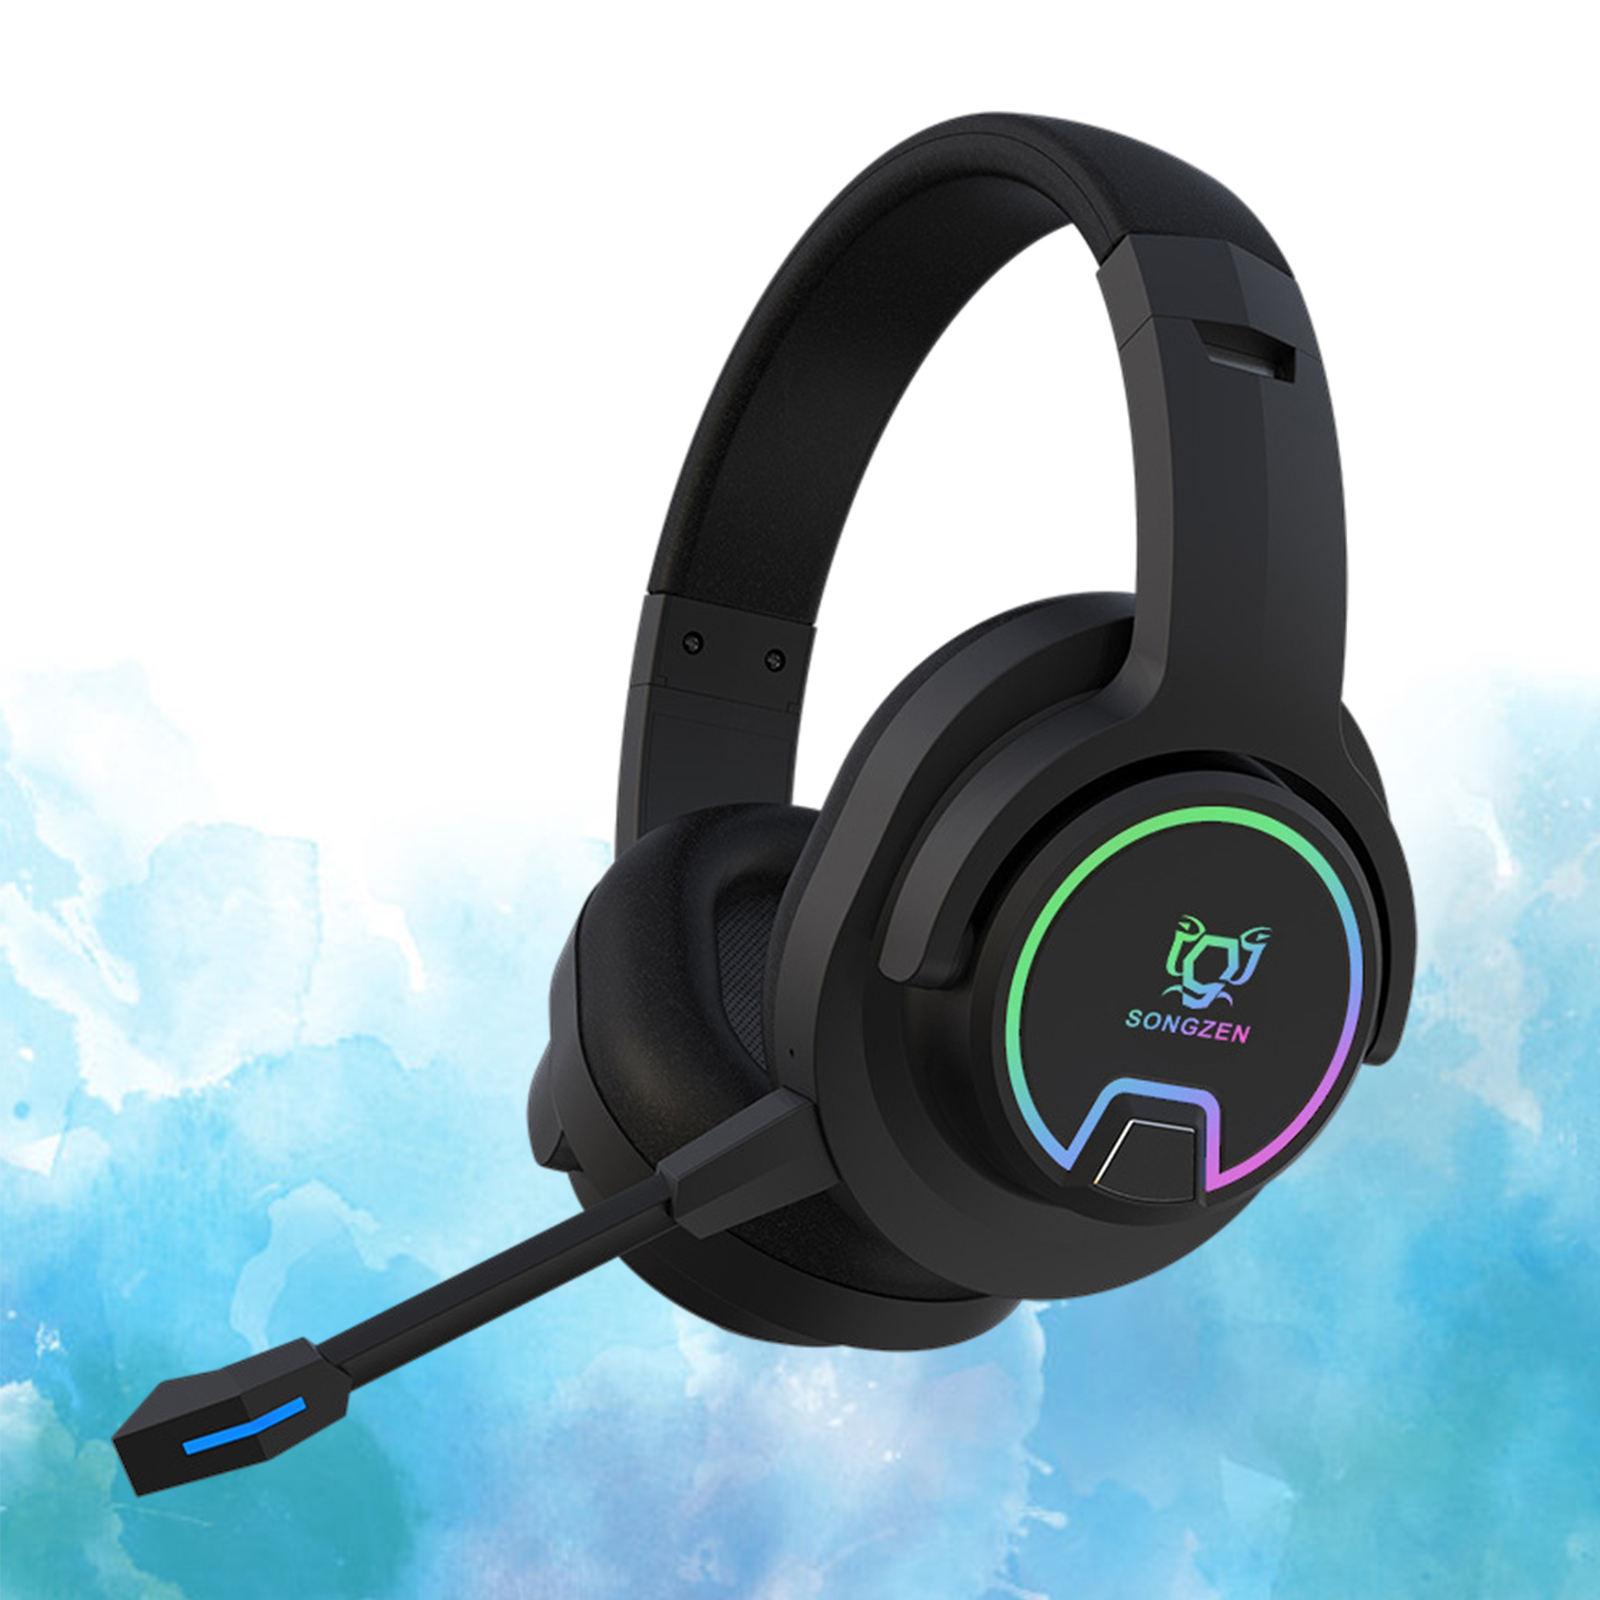 RGB سماعة لاسلكية تعمل بالبلوتوث سماعة الألعاب سماعات ستيريو فوق الأذن للاعبين-أسود